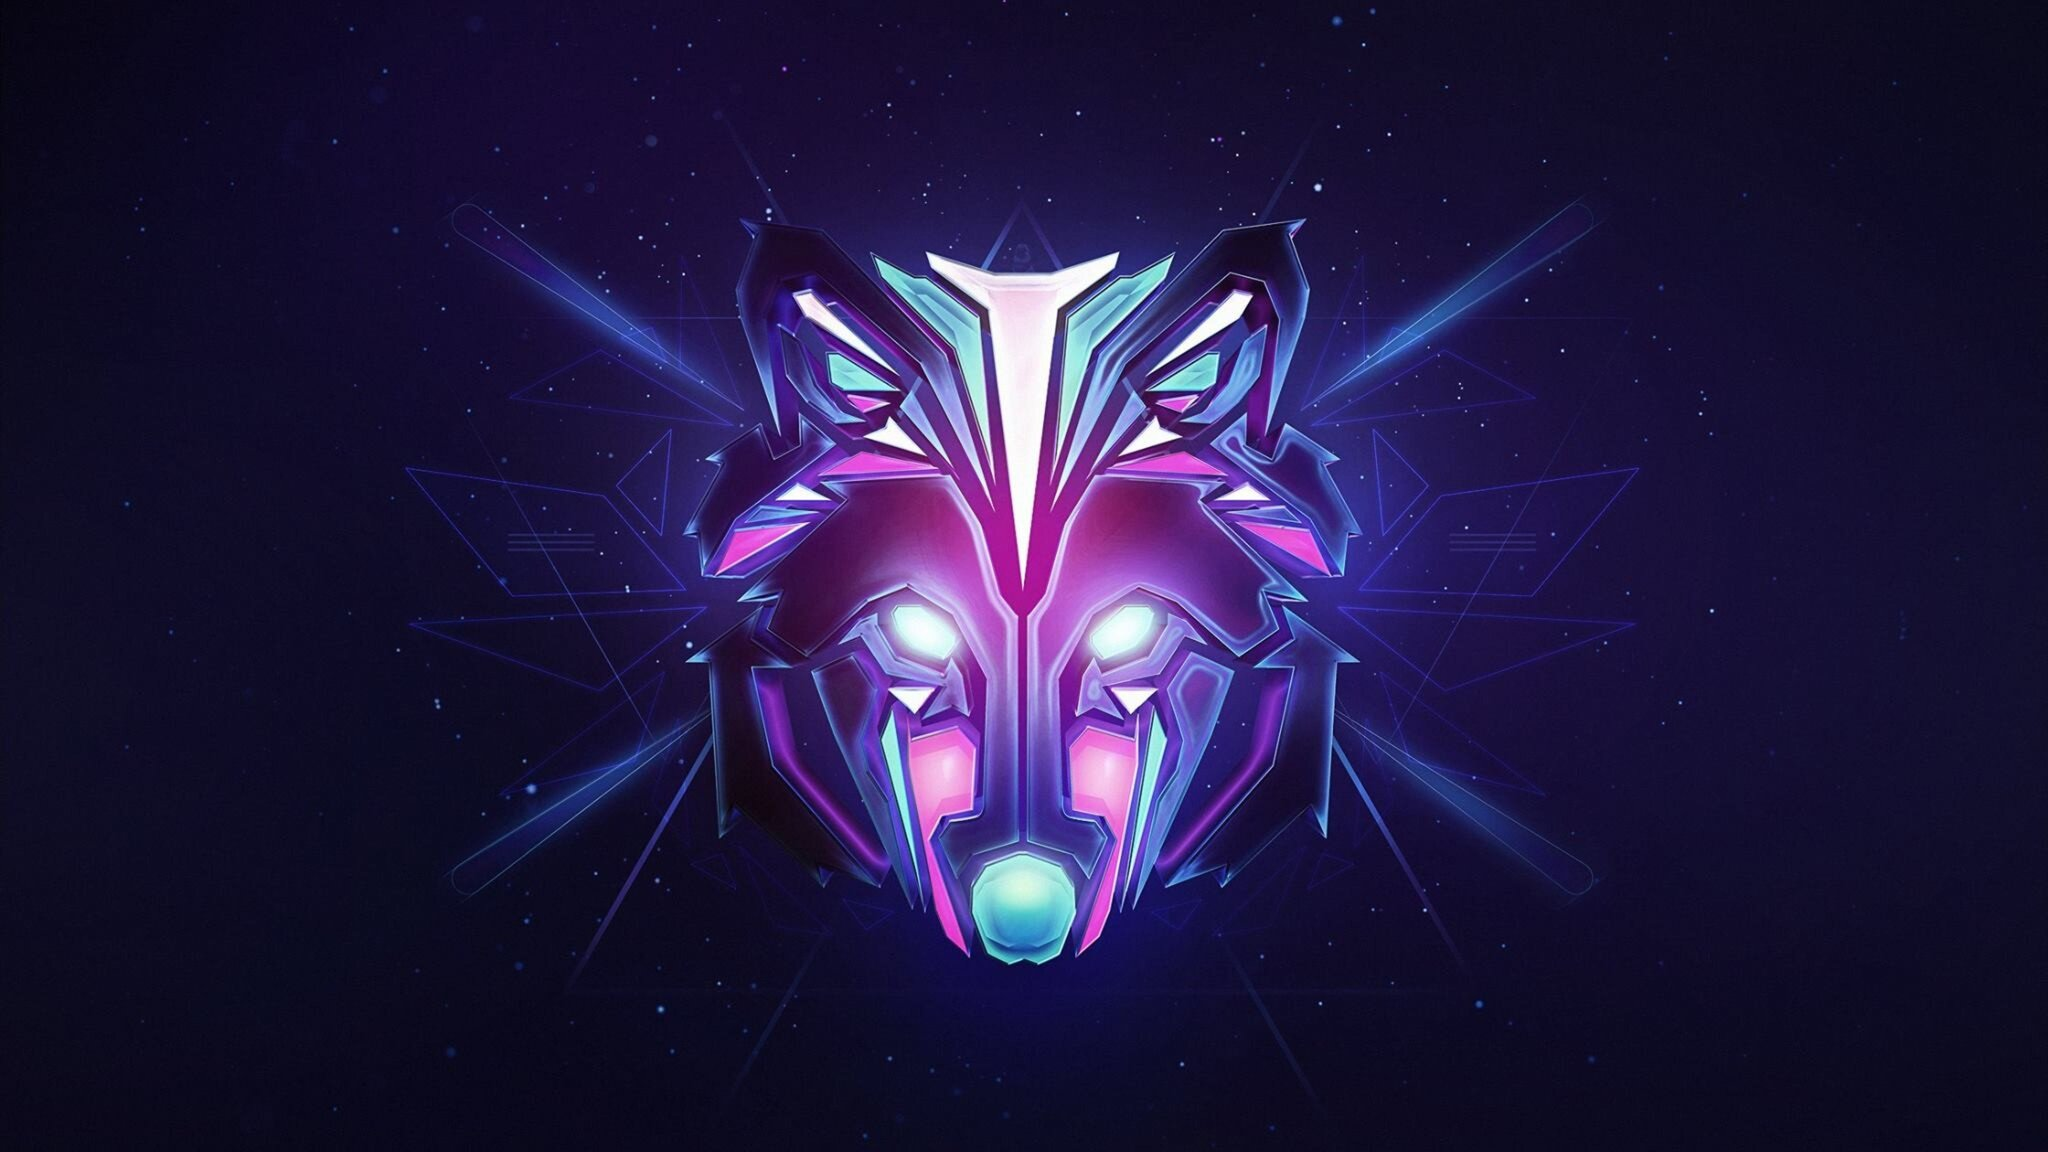 2048x1152 Wolf Colorful Minimalism 2048x1152 Resolution HD